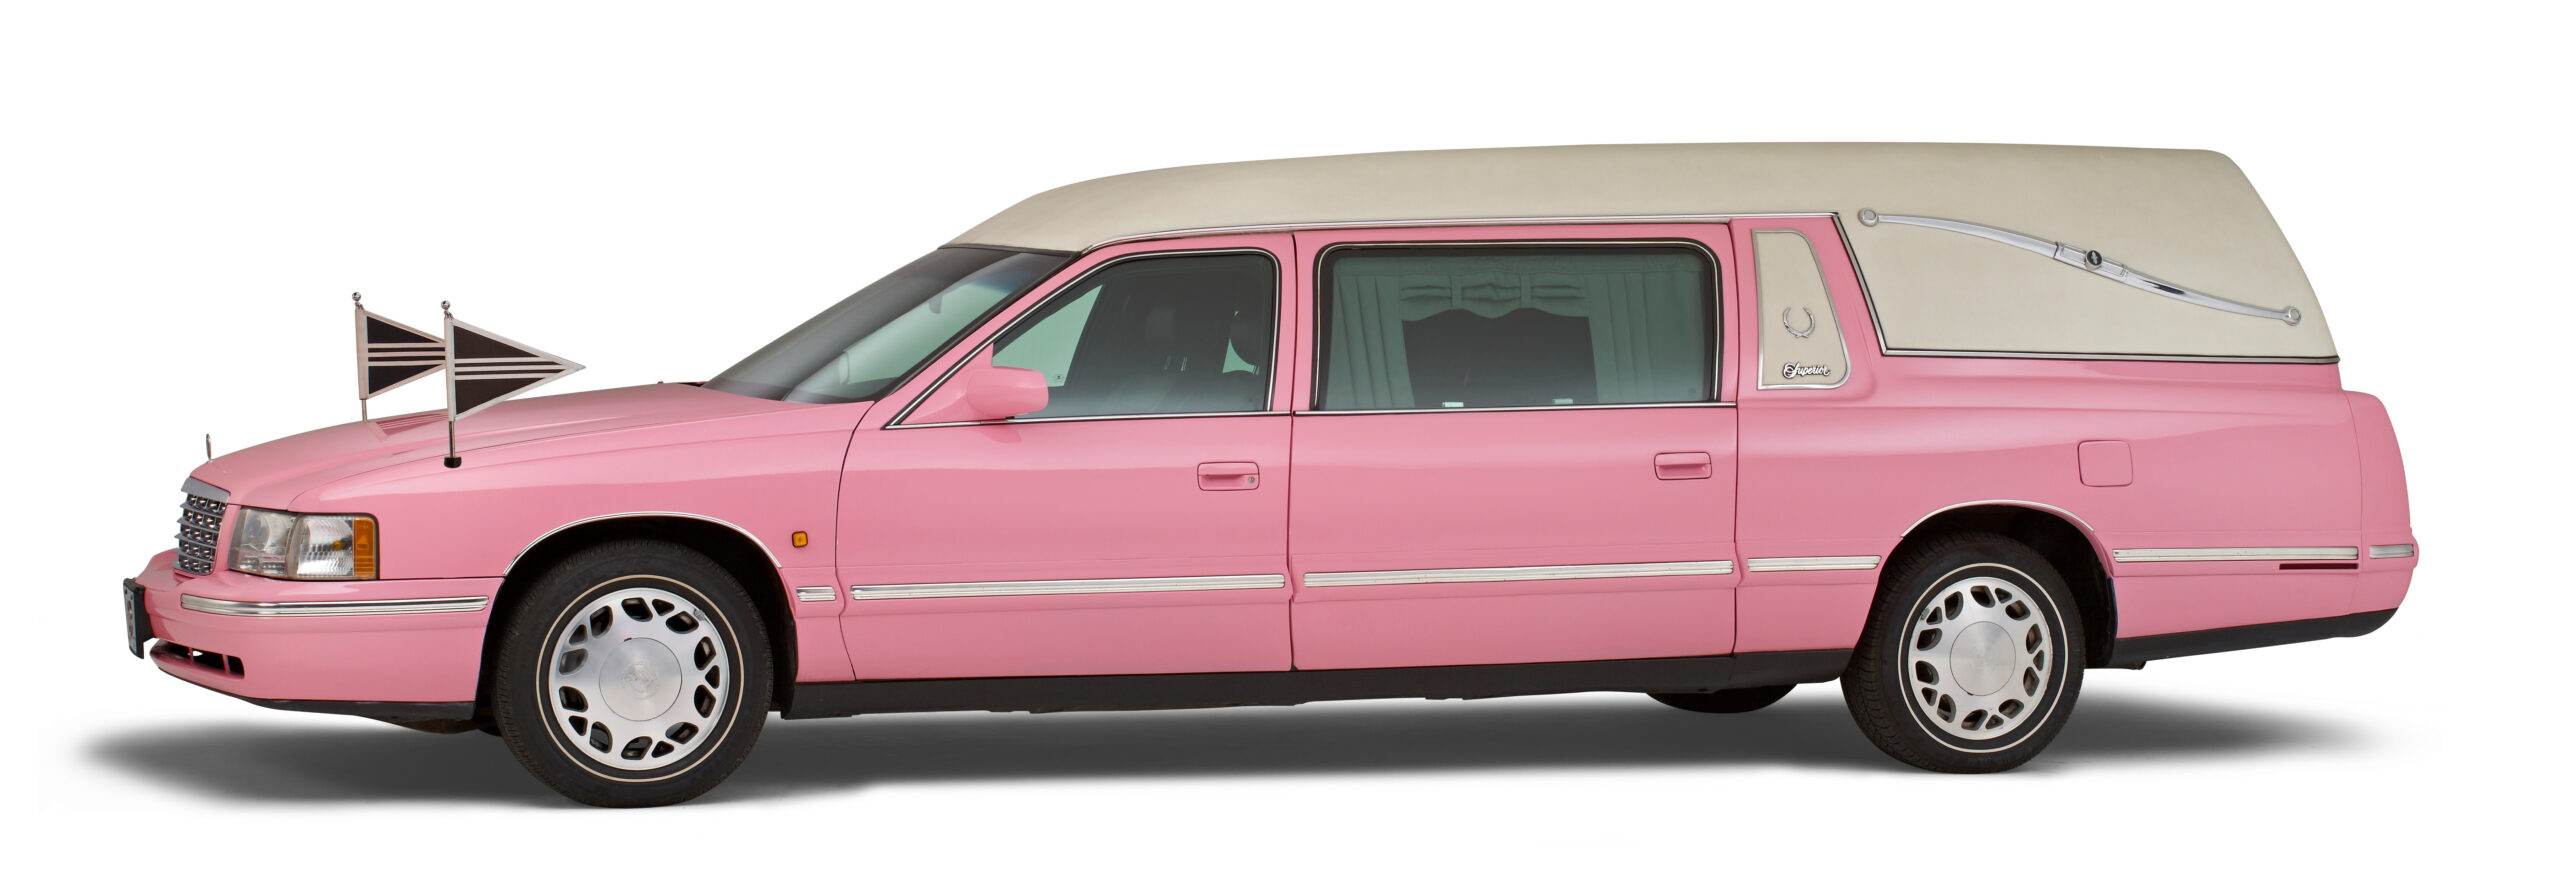 Roze Cadillac rouwauto